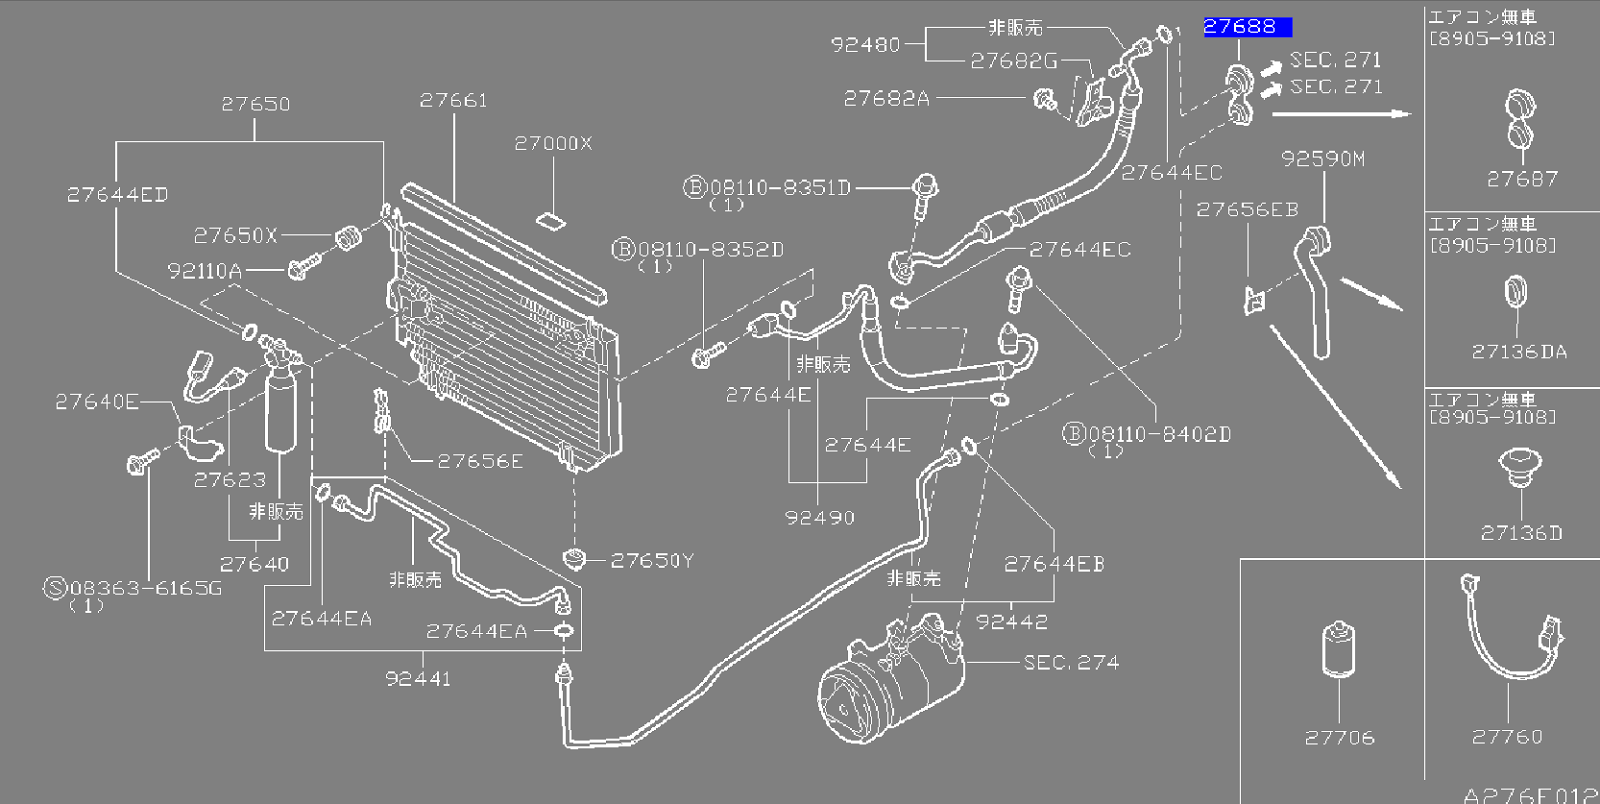 medium resolution of ac wiring diagram r32 gtr use wiring diagram ac wiring diagram r32 gtr